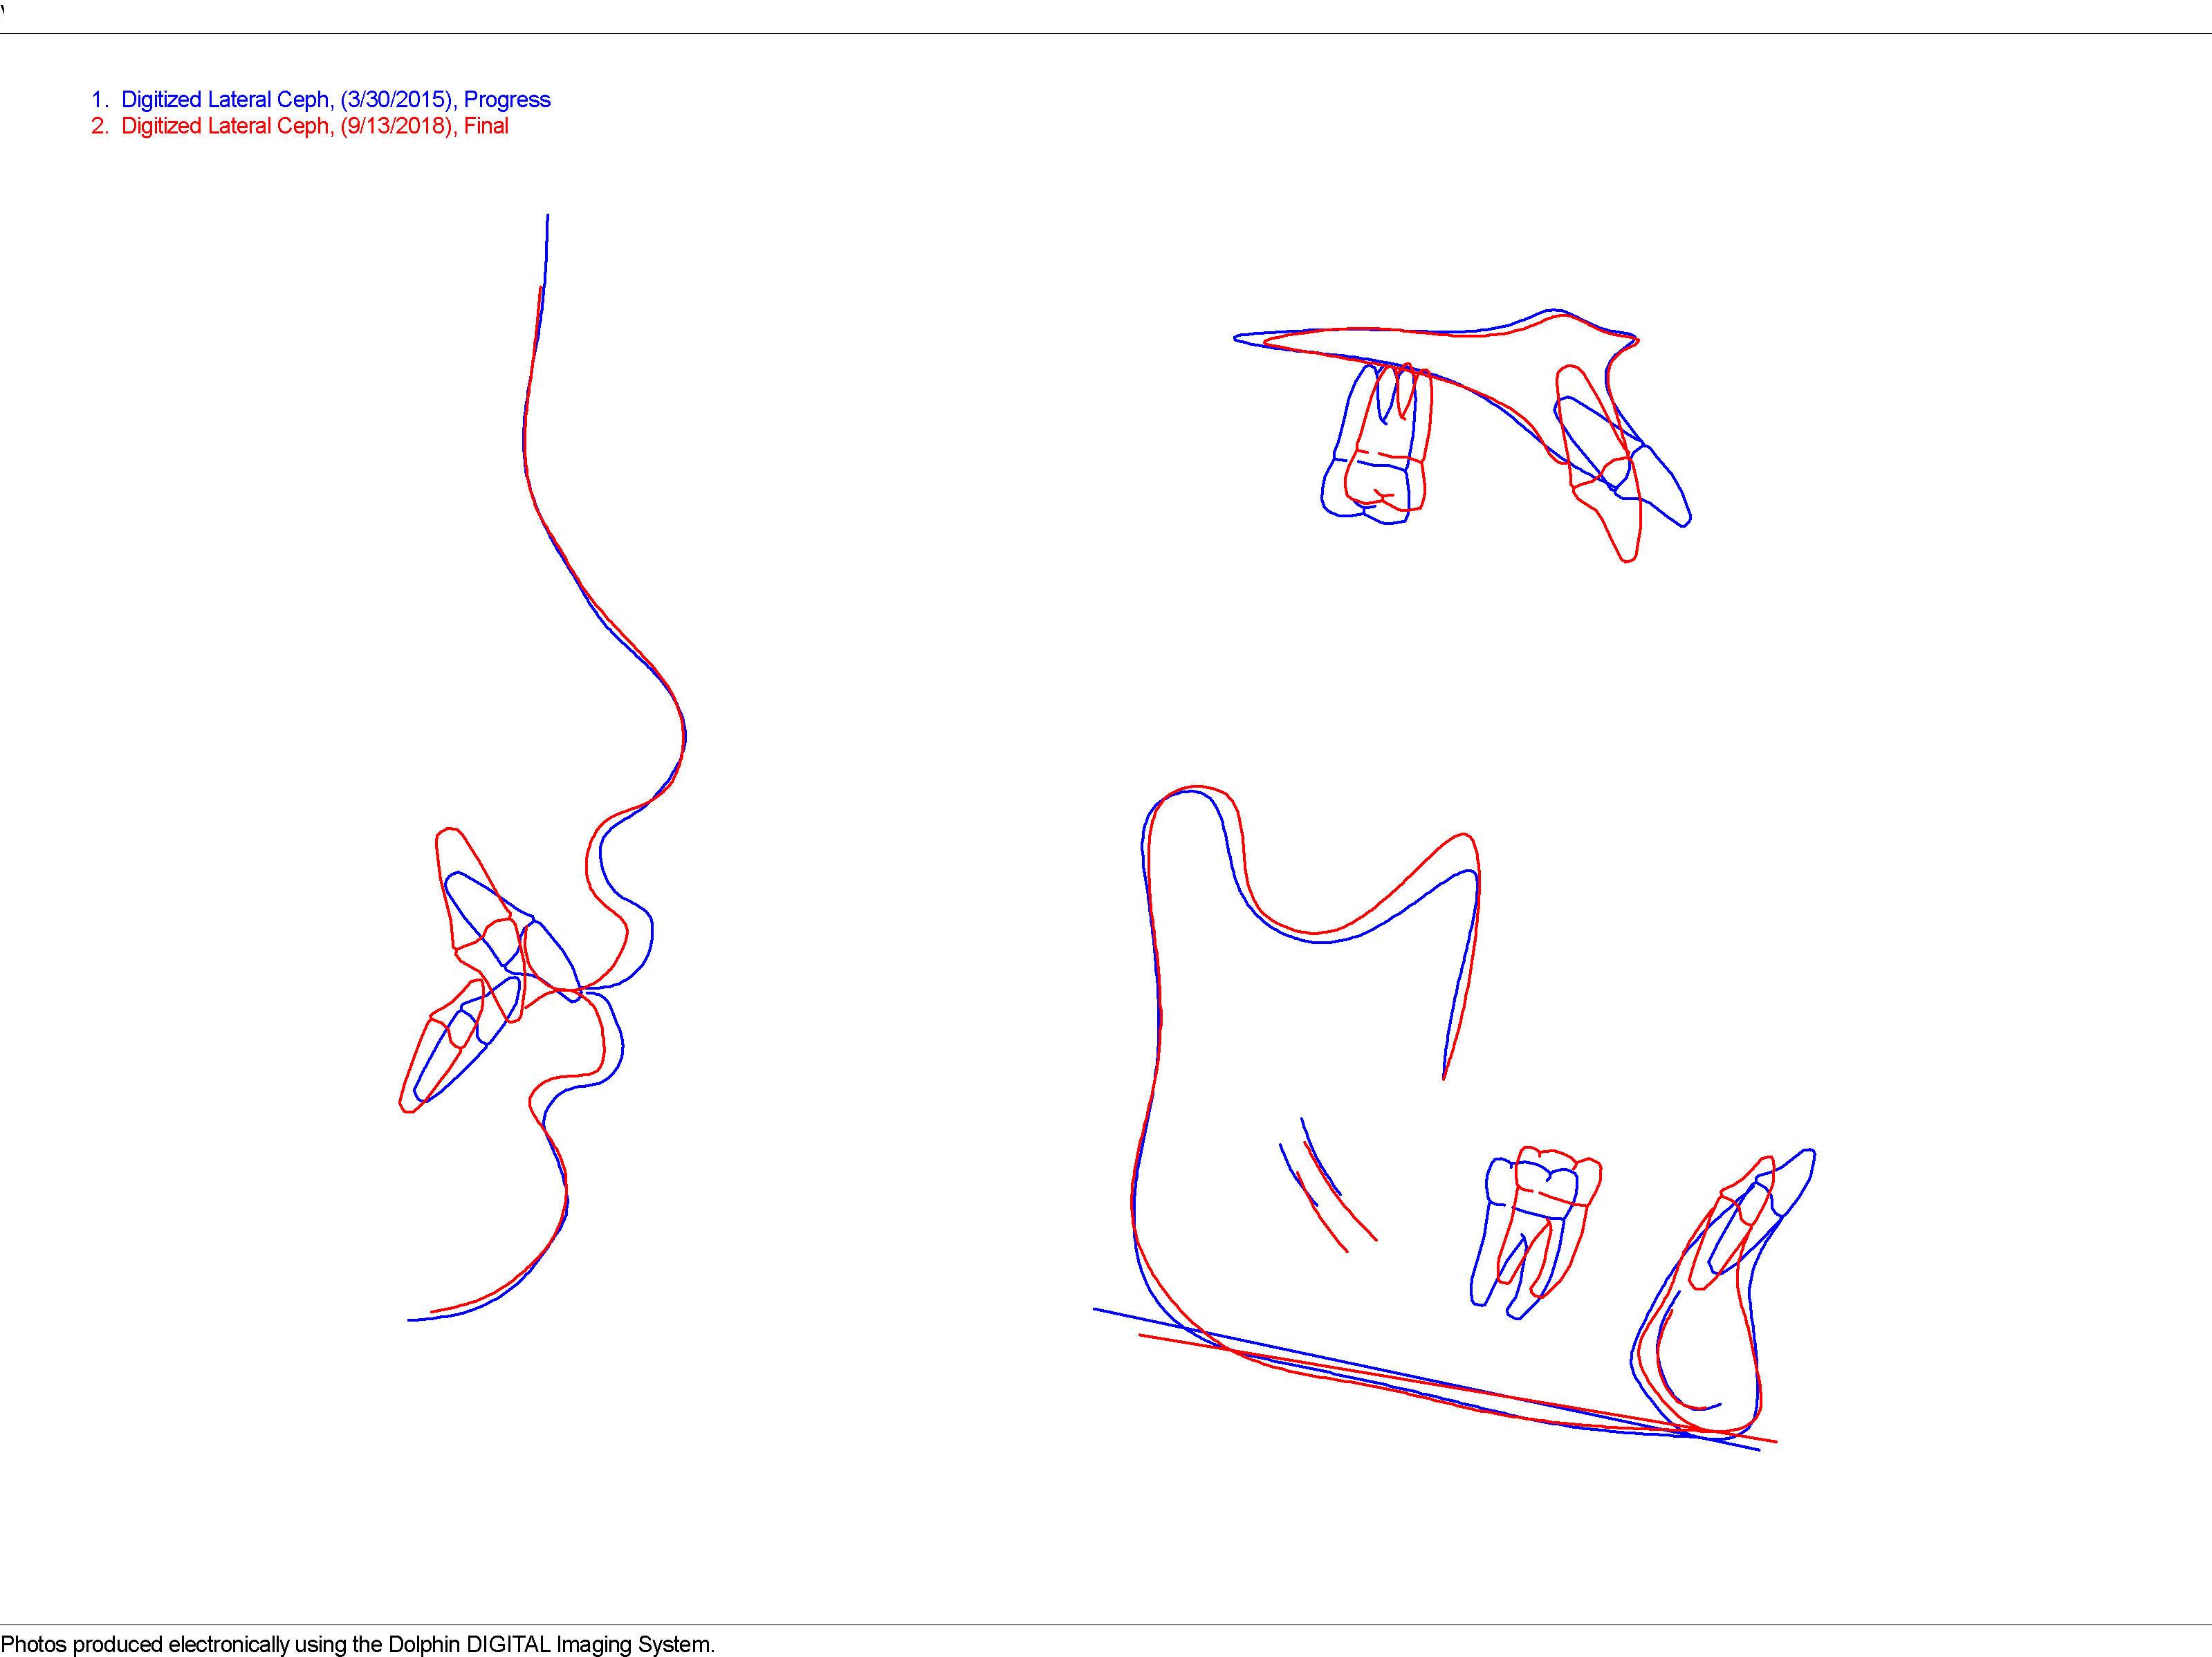 Superimposition Progress-Final_002